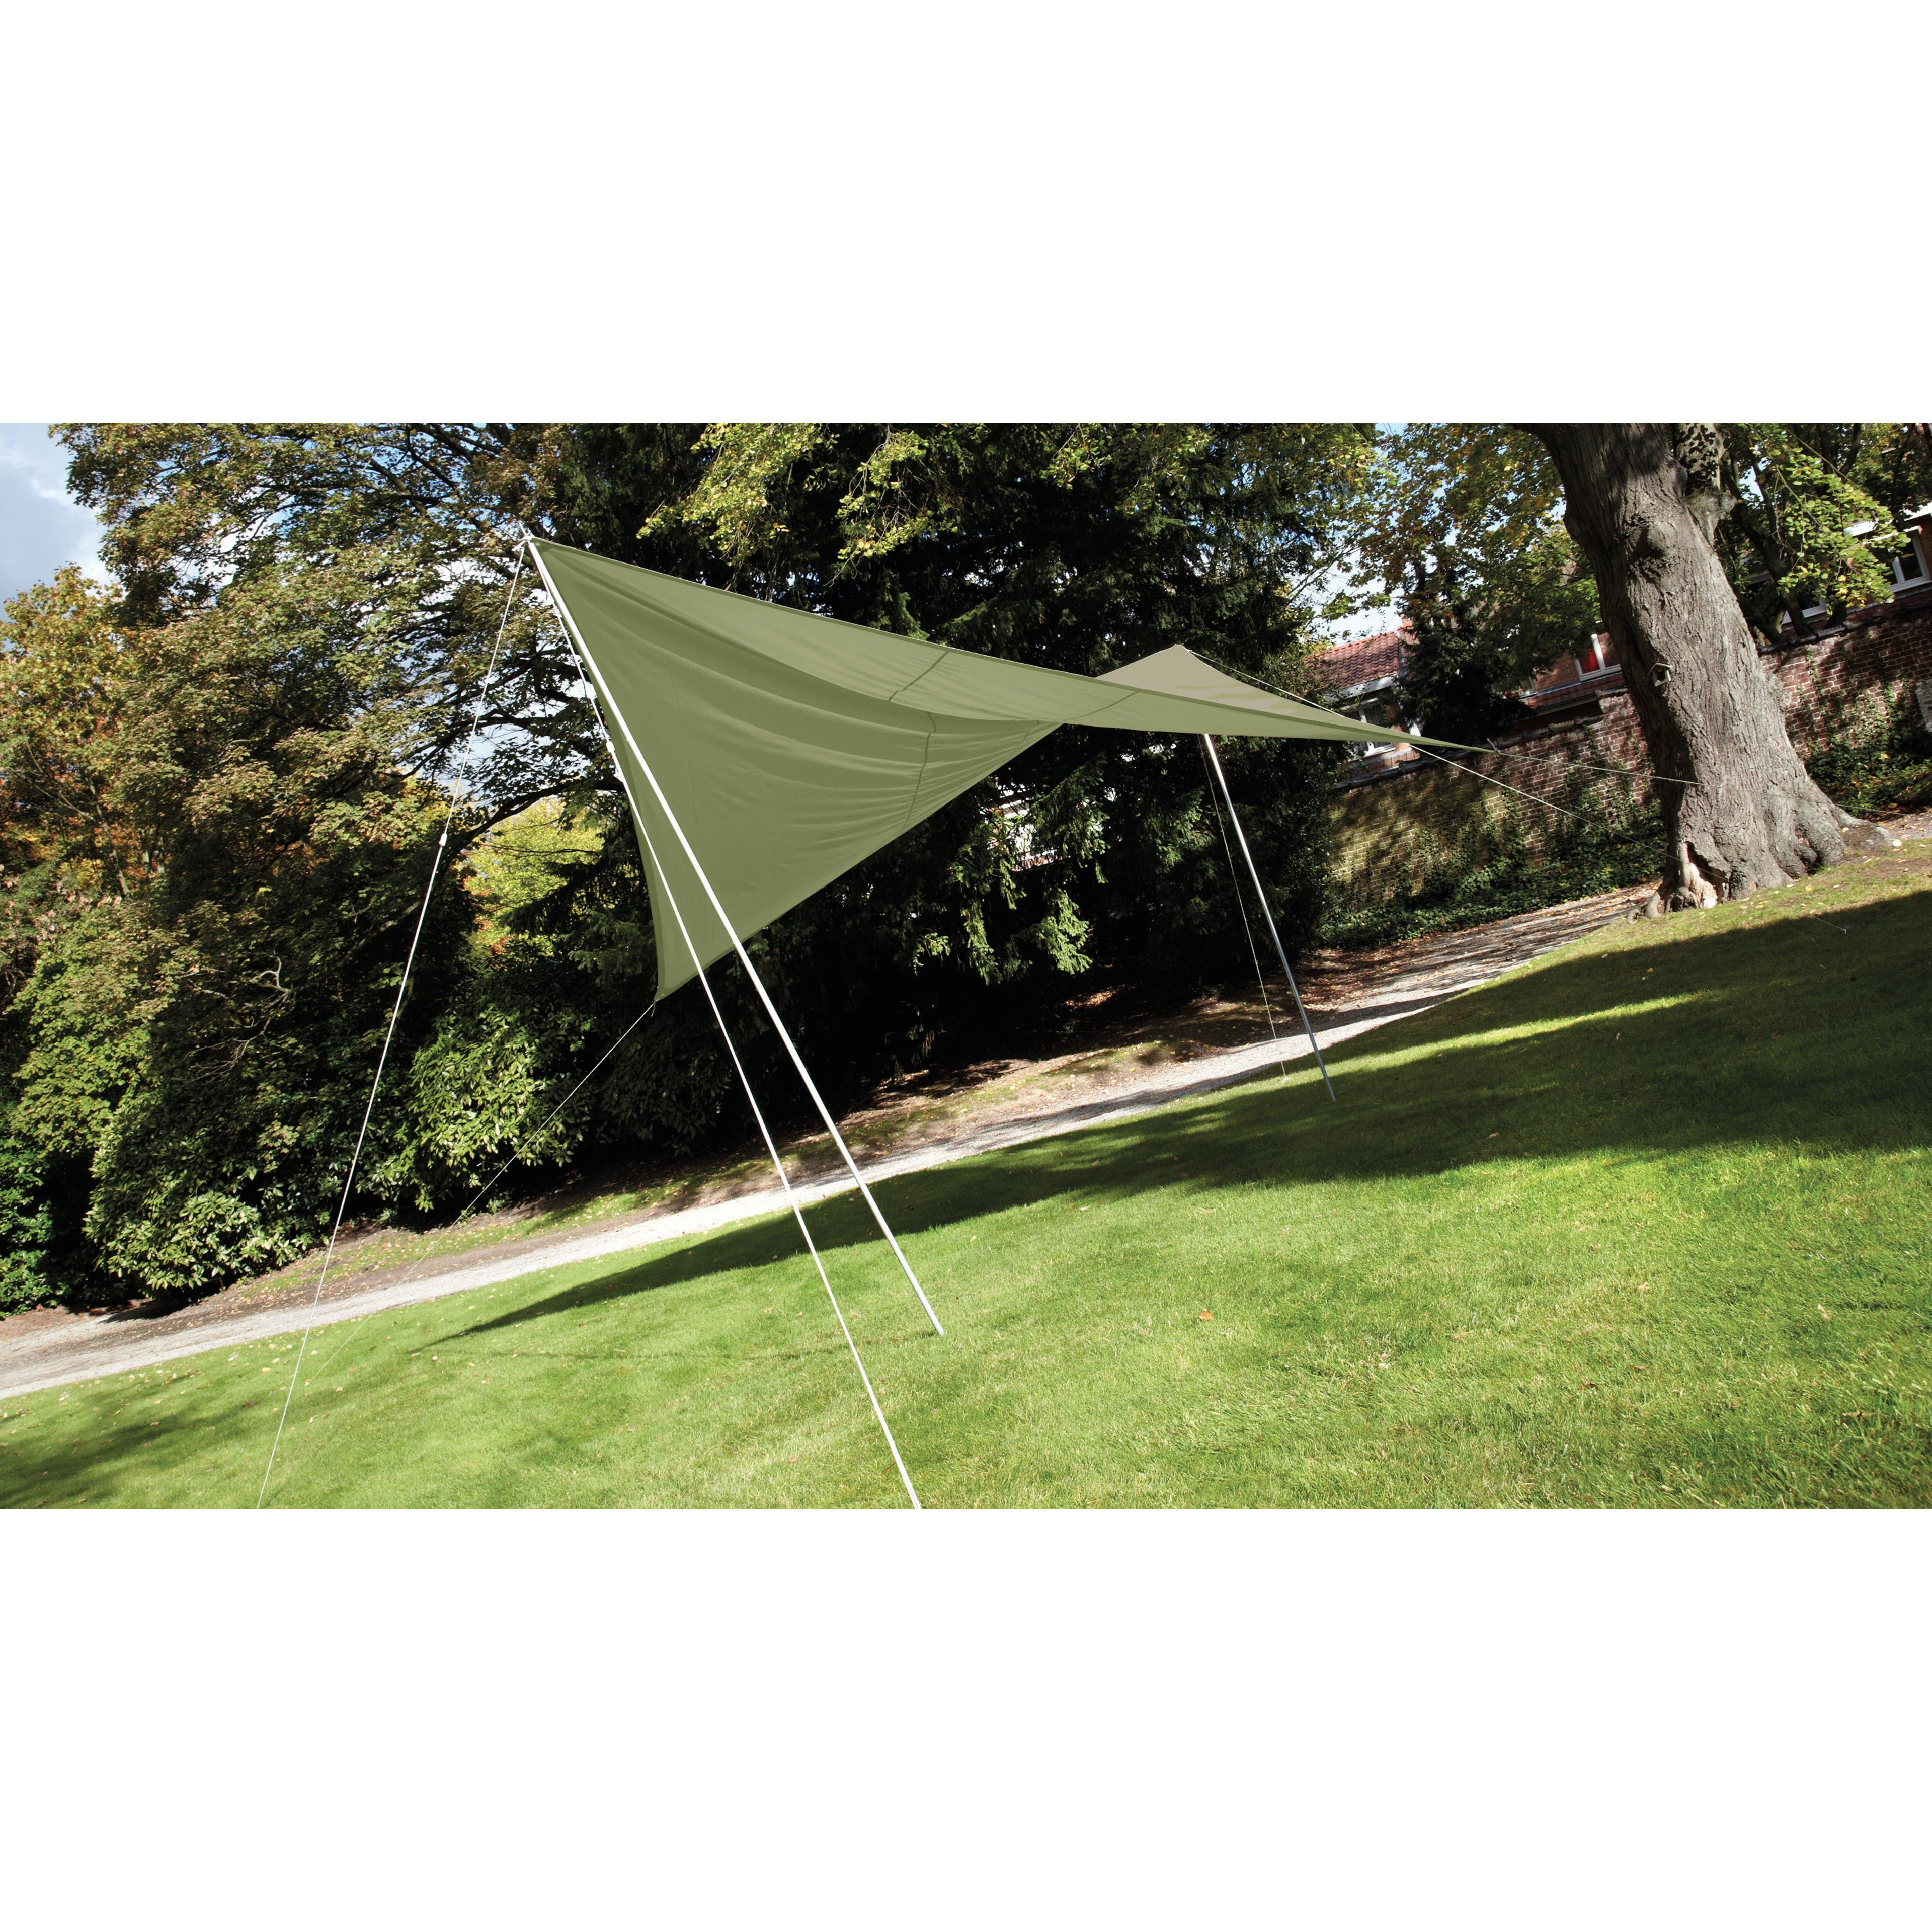 Voile D Ombrage Imperméable voile d'ombrage carrée 3.60m olive | oviala